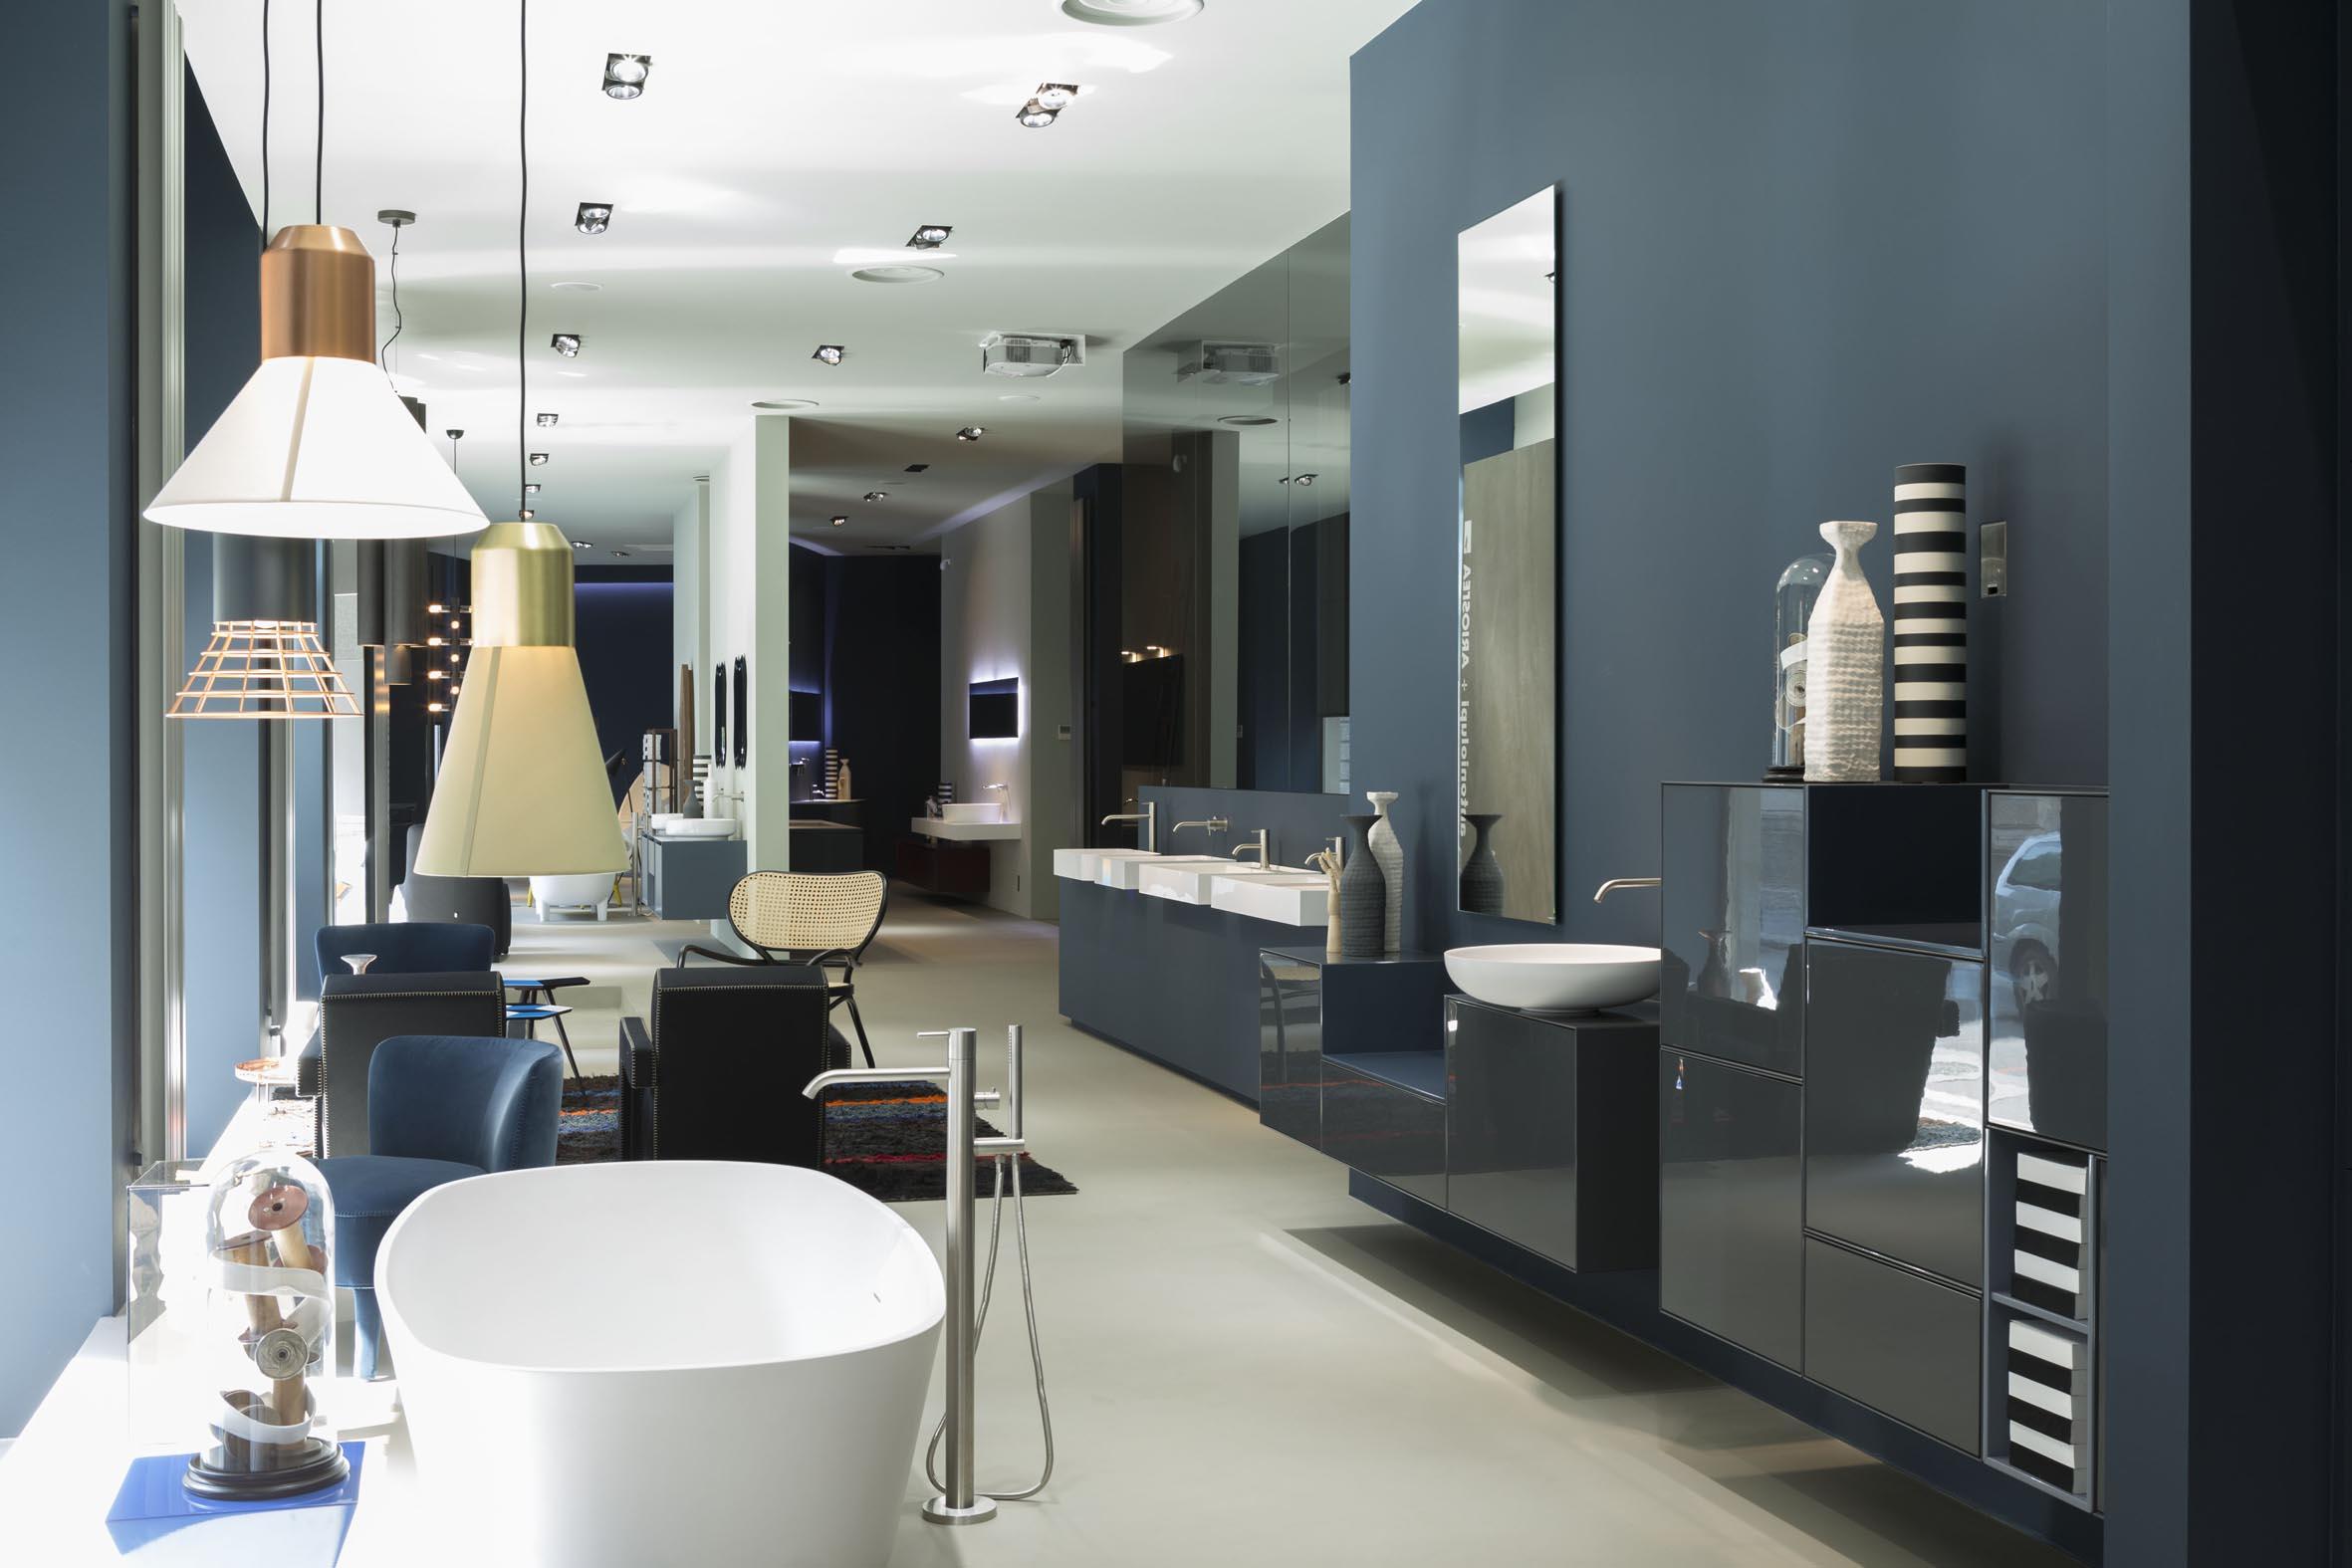 Antonio lupi restyled milan showroom for Outlet arredamento design milano